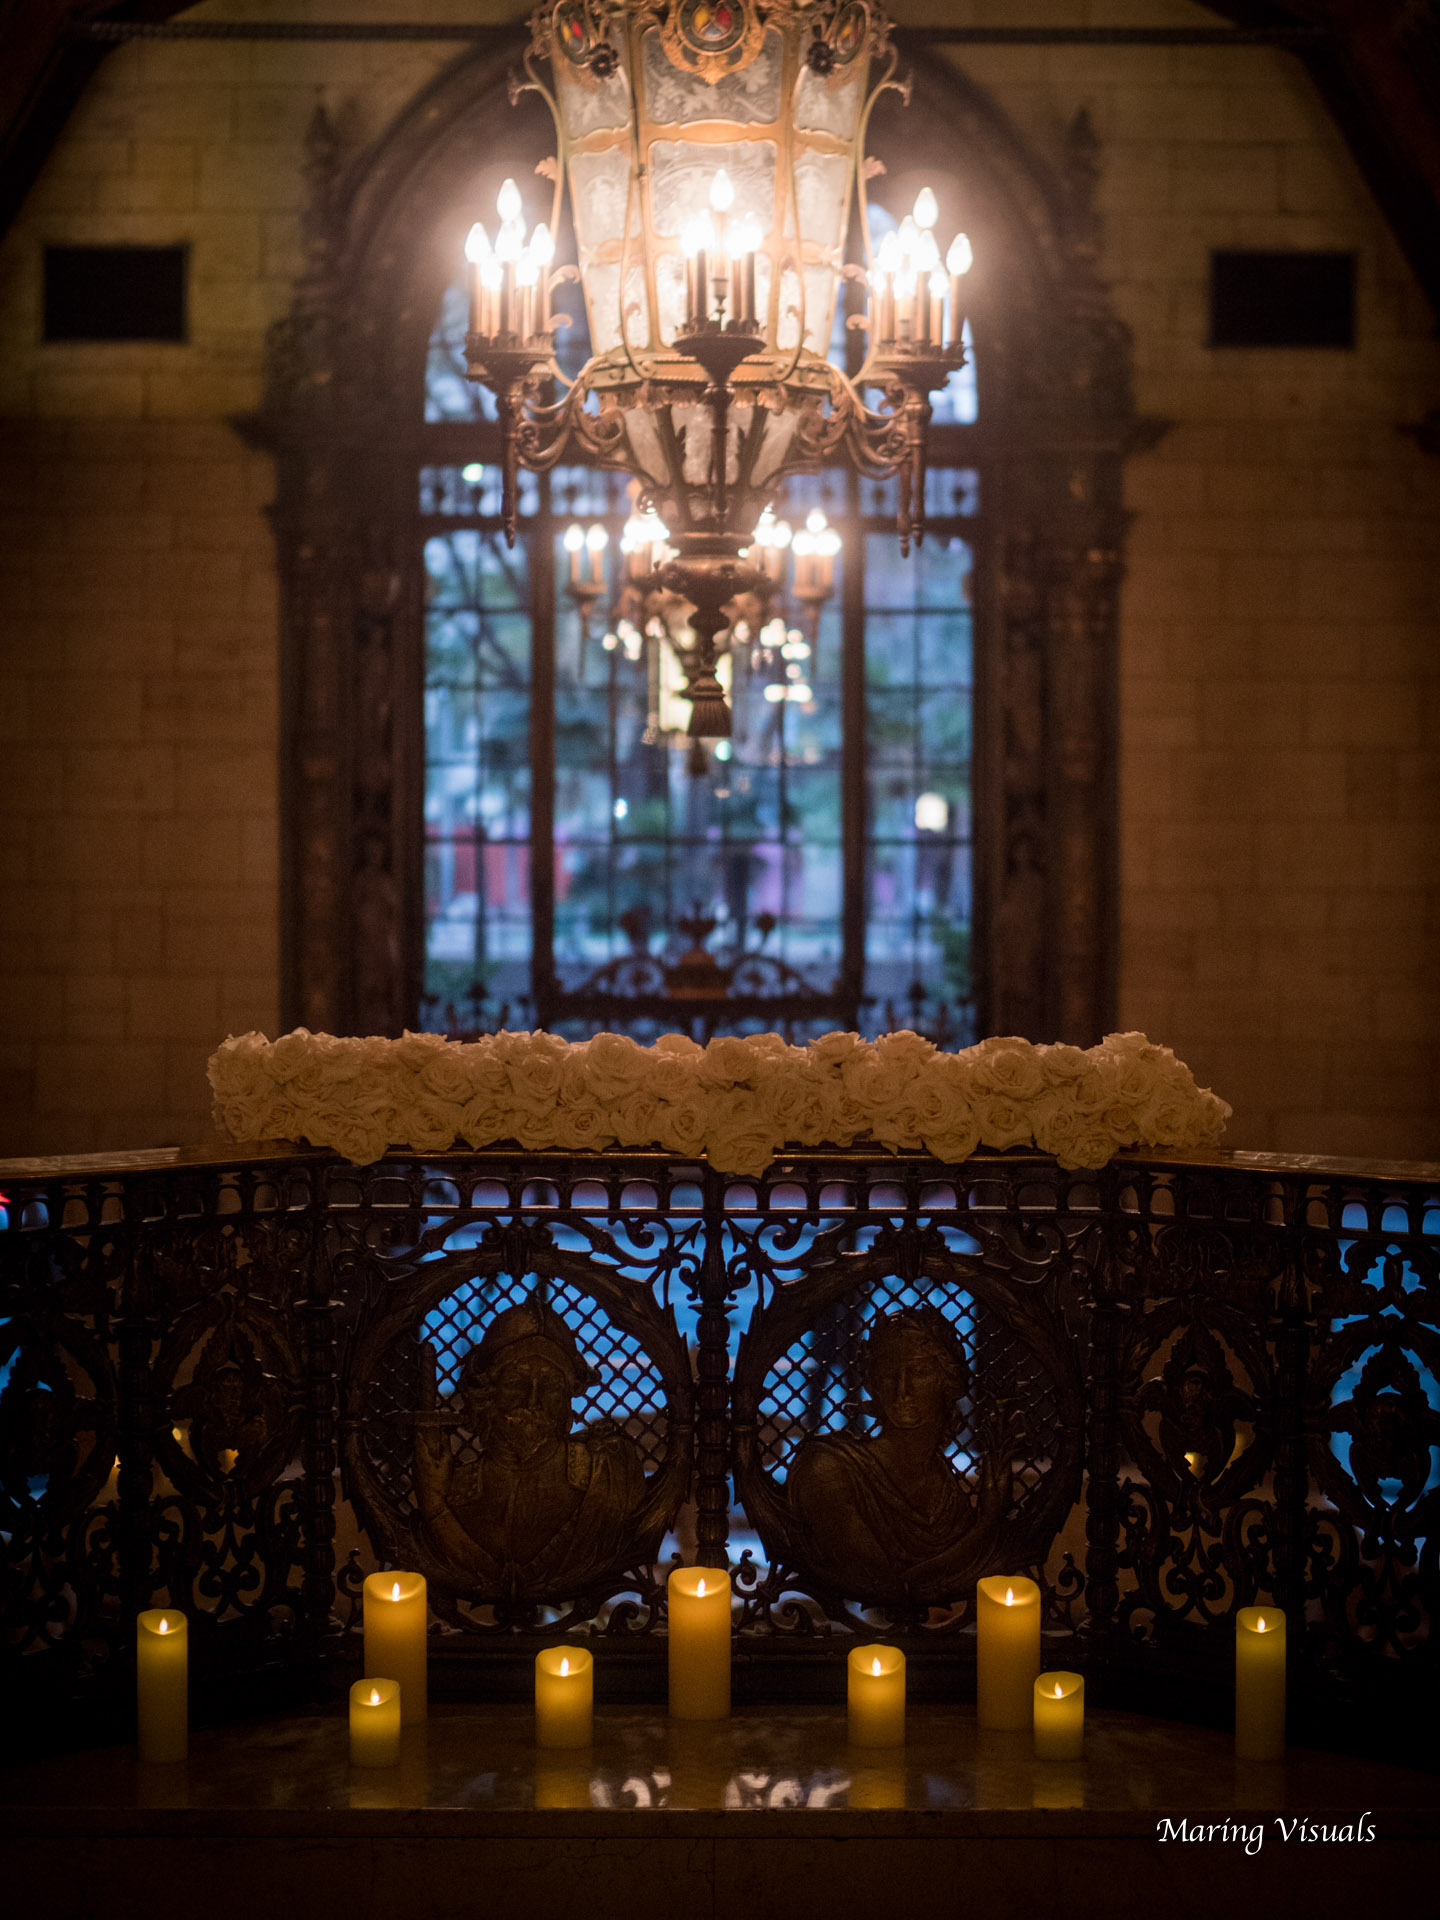 David Tutera Weddings by Maring Visuals 00539.jpg